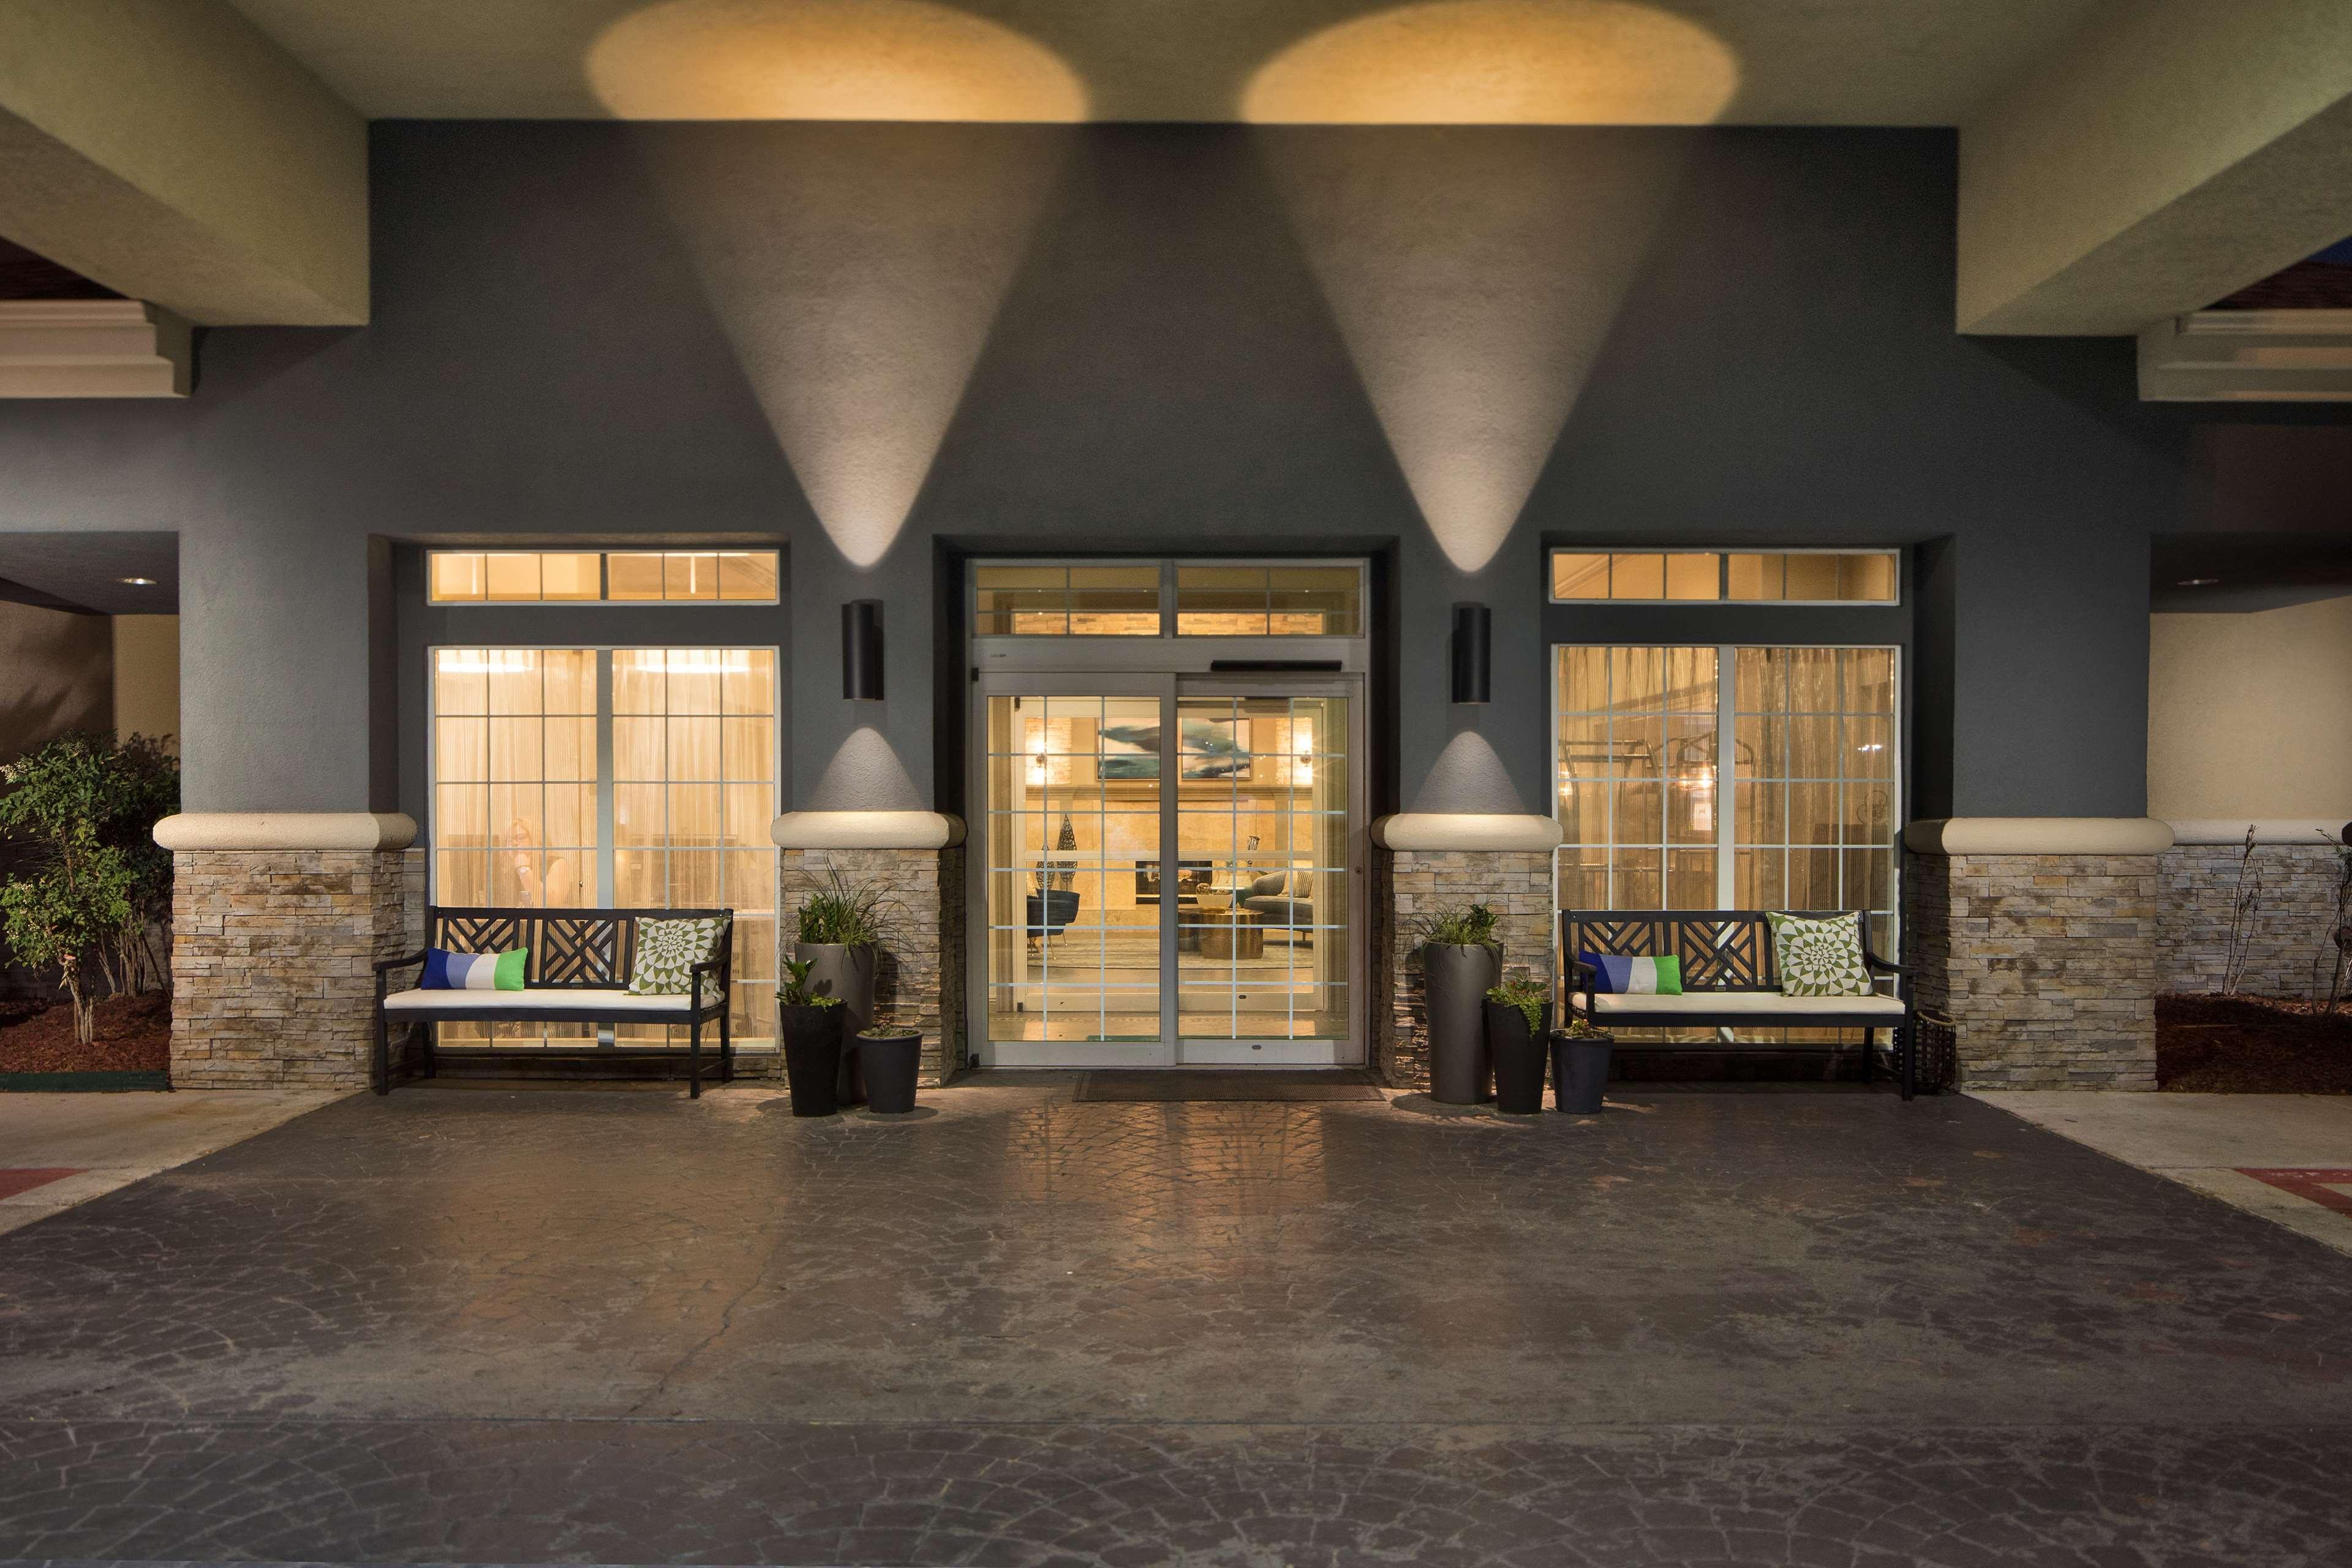 Homewood Suites by Hilton Lubbock image 3